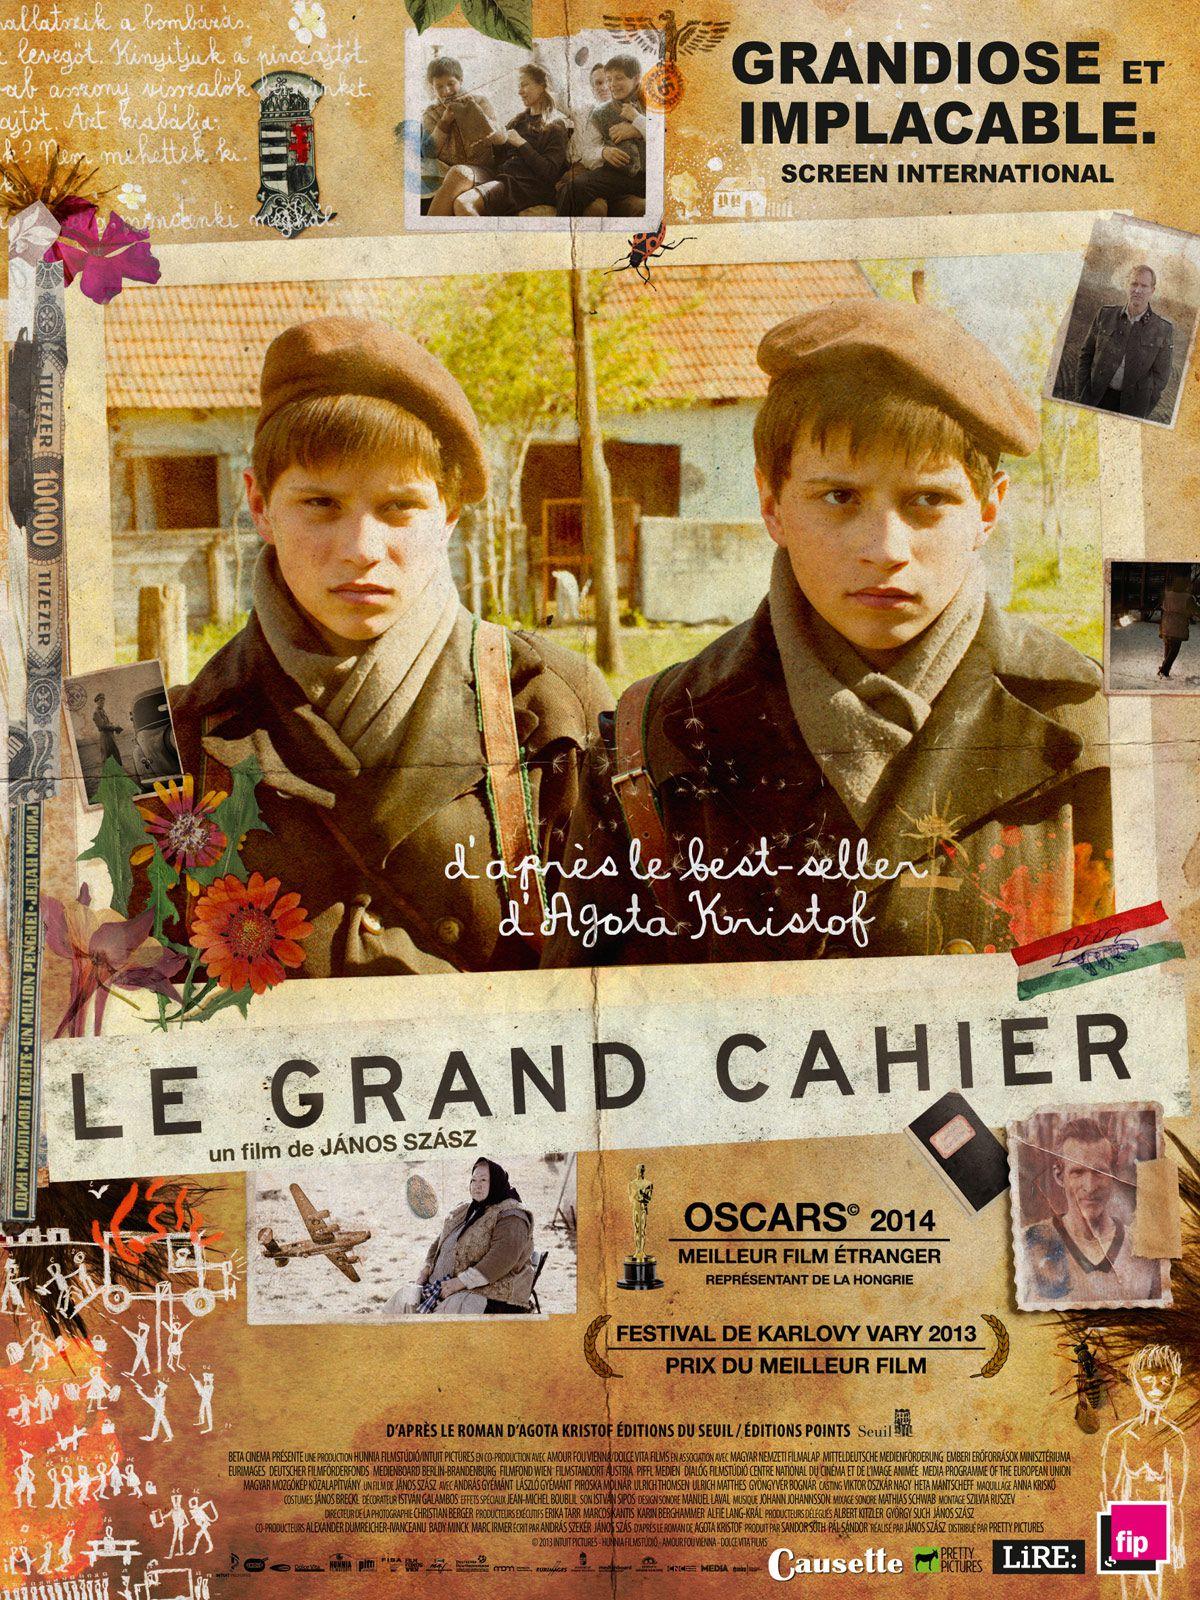 Le Grand Cahier - Film (2014)